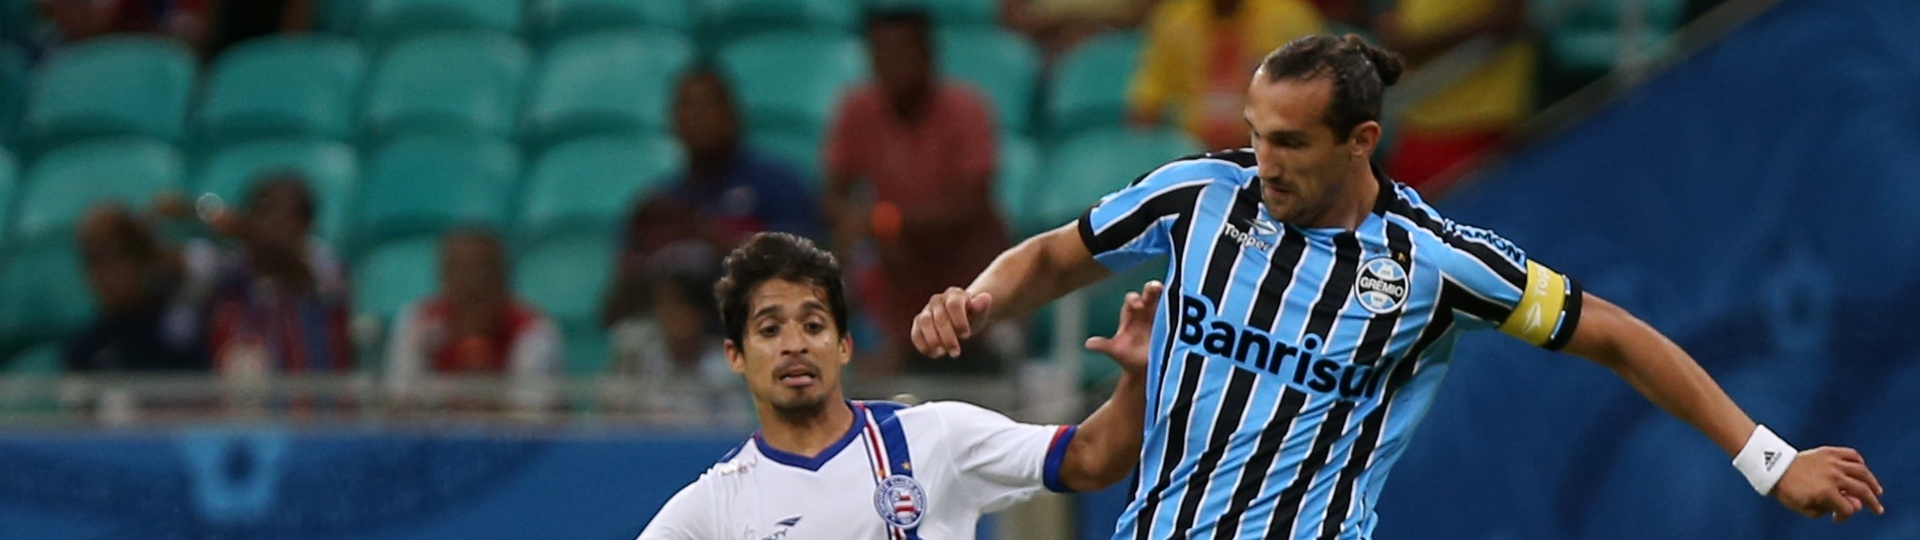 Hernán Barcos (Grêmio) e Roniery (Bahia) disputam bola na Arena Fonte Nova